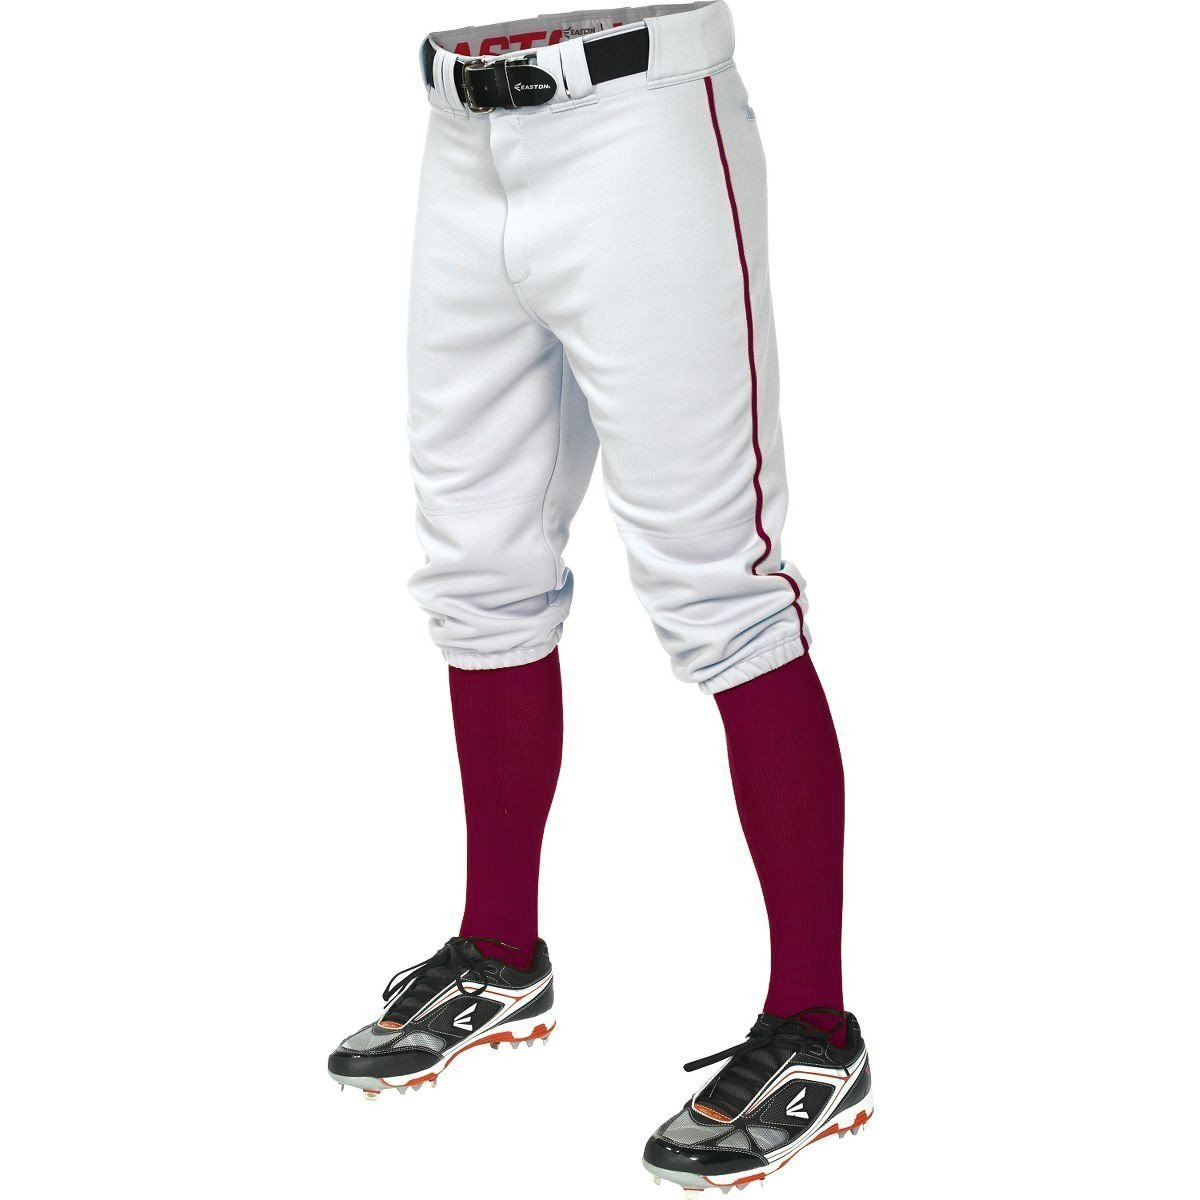 Easton Boy's Pro Knicker Pants Baseball Youth w/ Piping Short (White/Green, YL)